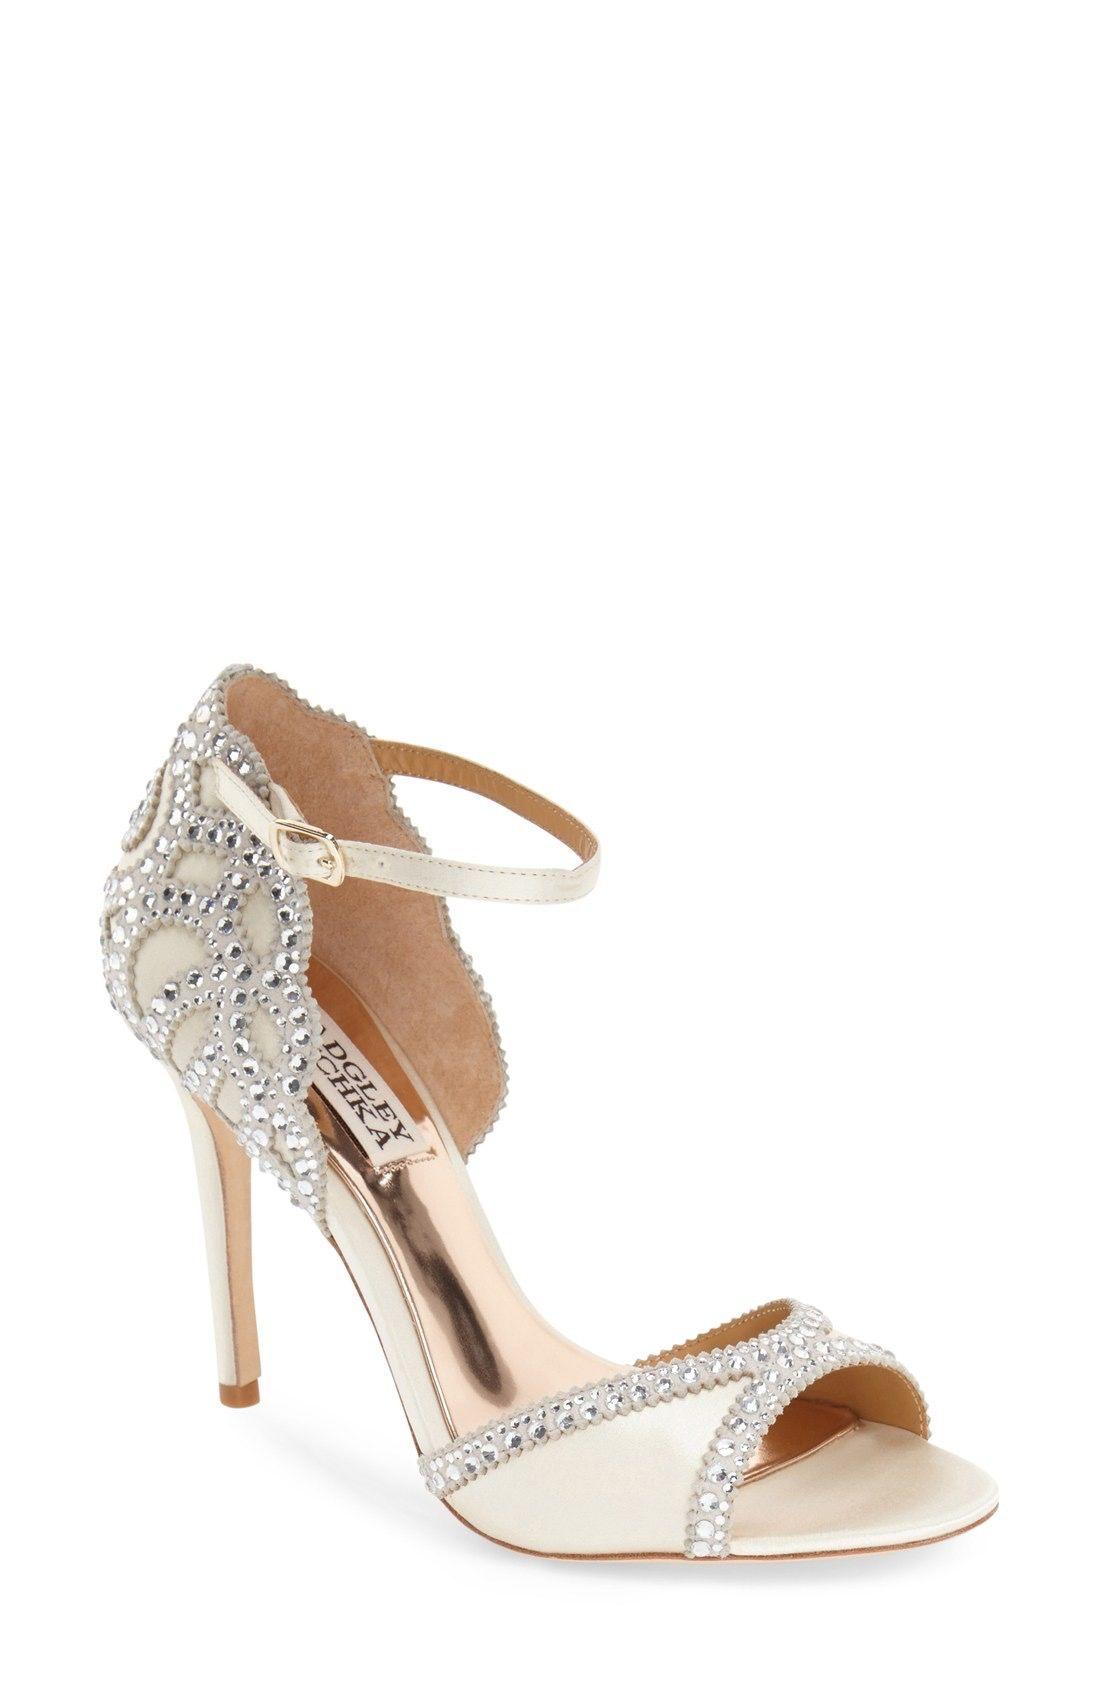 7581b2f37e2 Badgley Mischka  Roxy  Sandals (Women) available at  Nordstrom ...